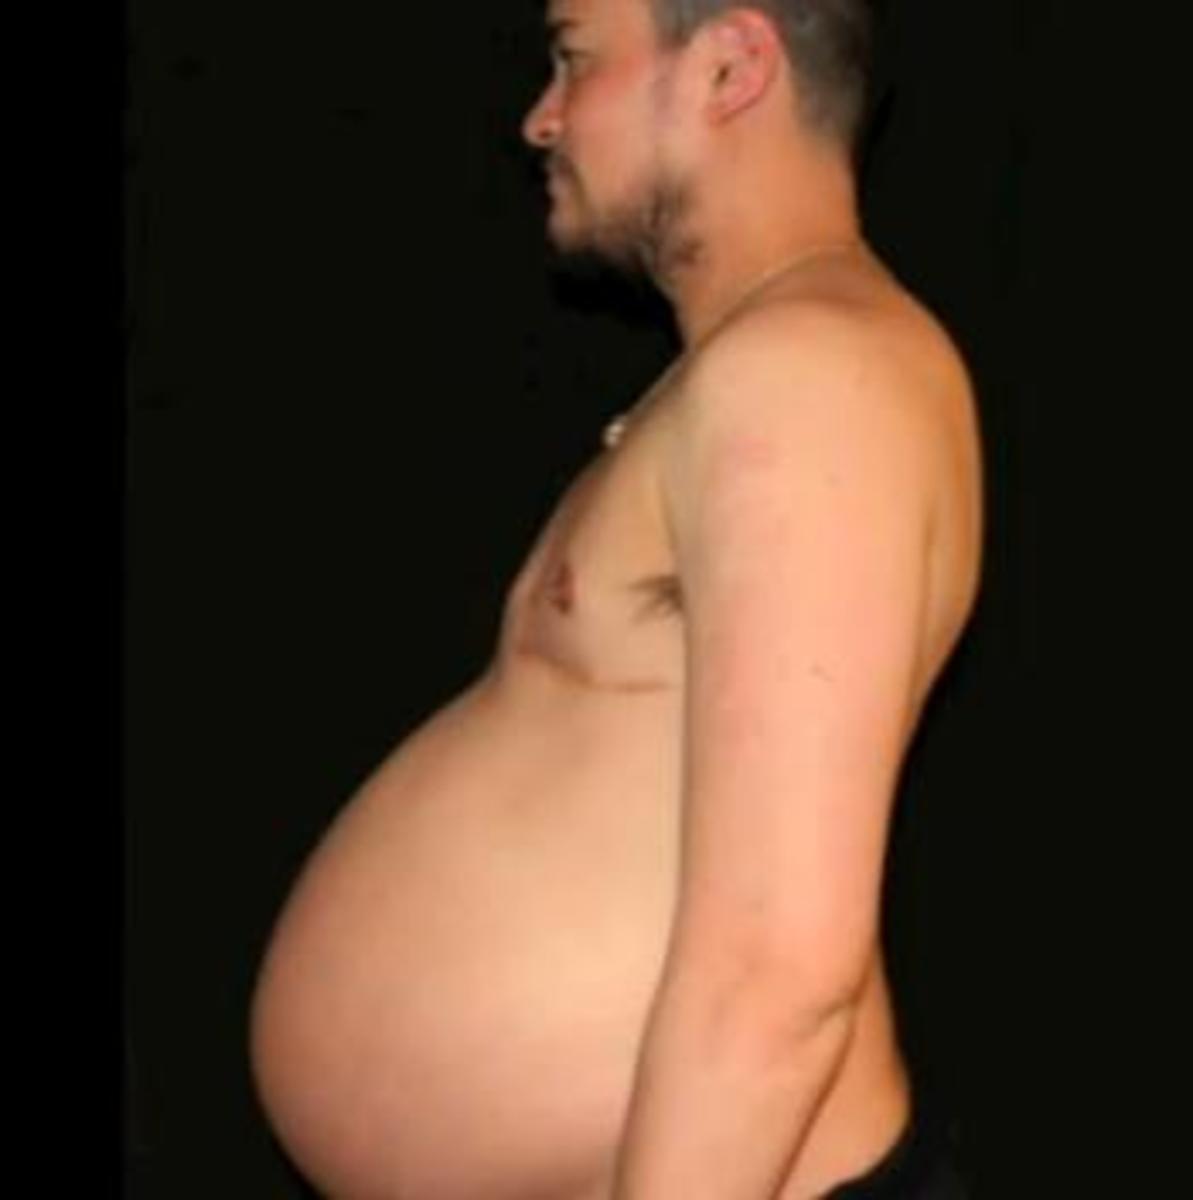 World's first pregnant man